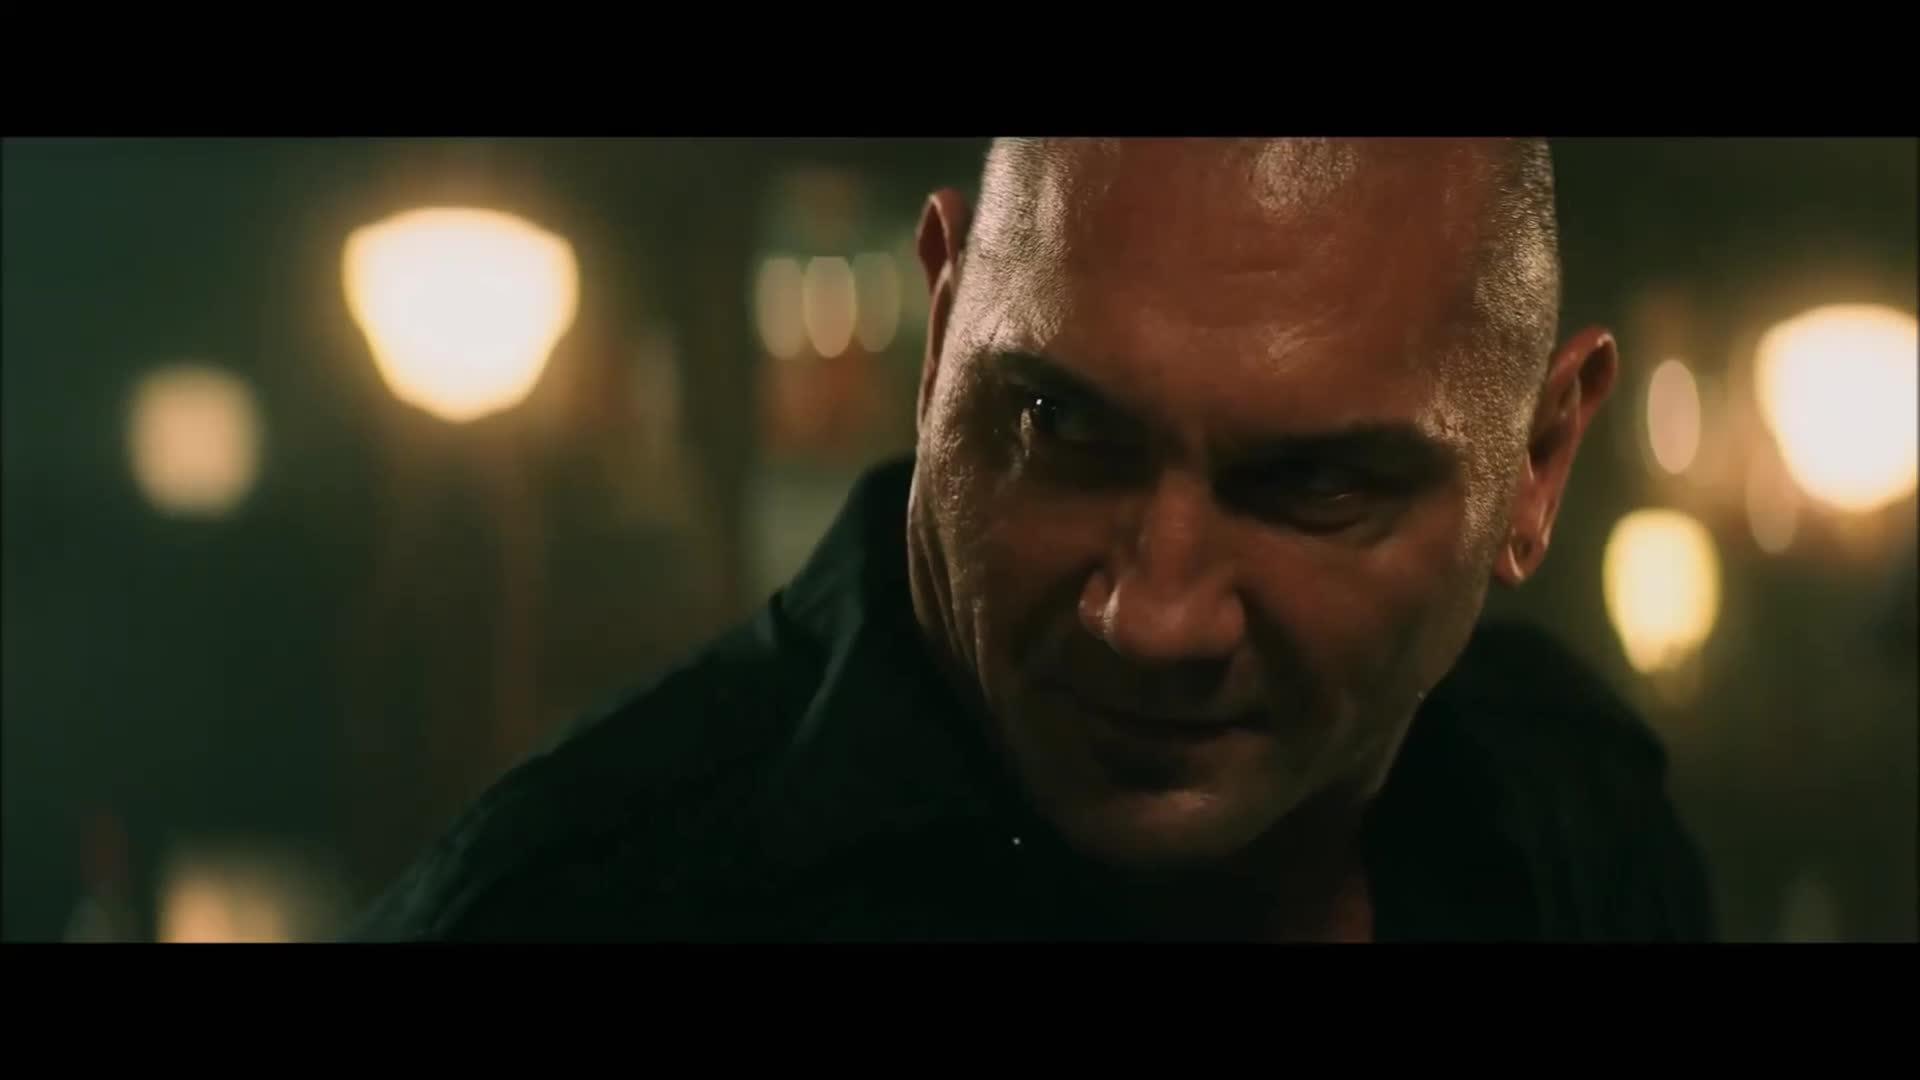 Batista phối hợp cùng sao hành động Sylvester Stallone trong Escape Plan 2: Hades